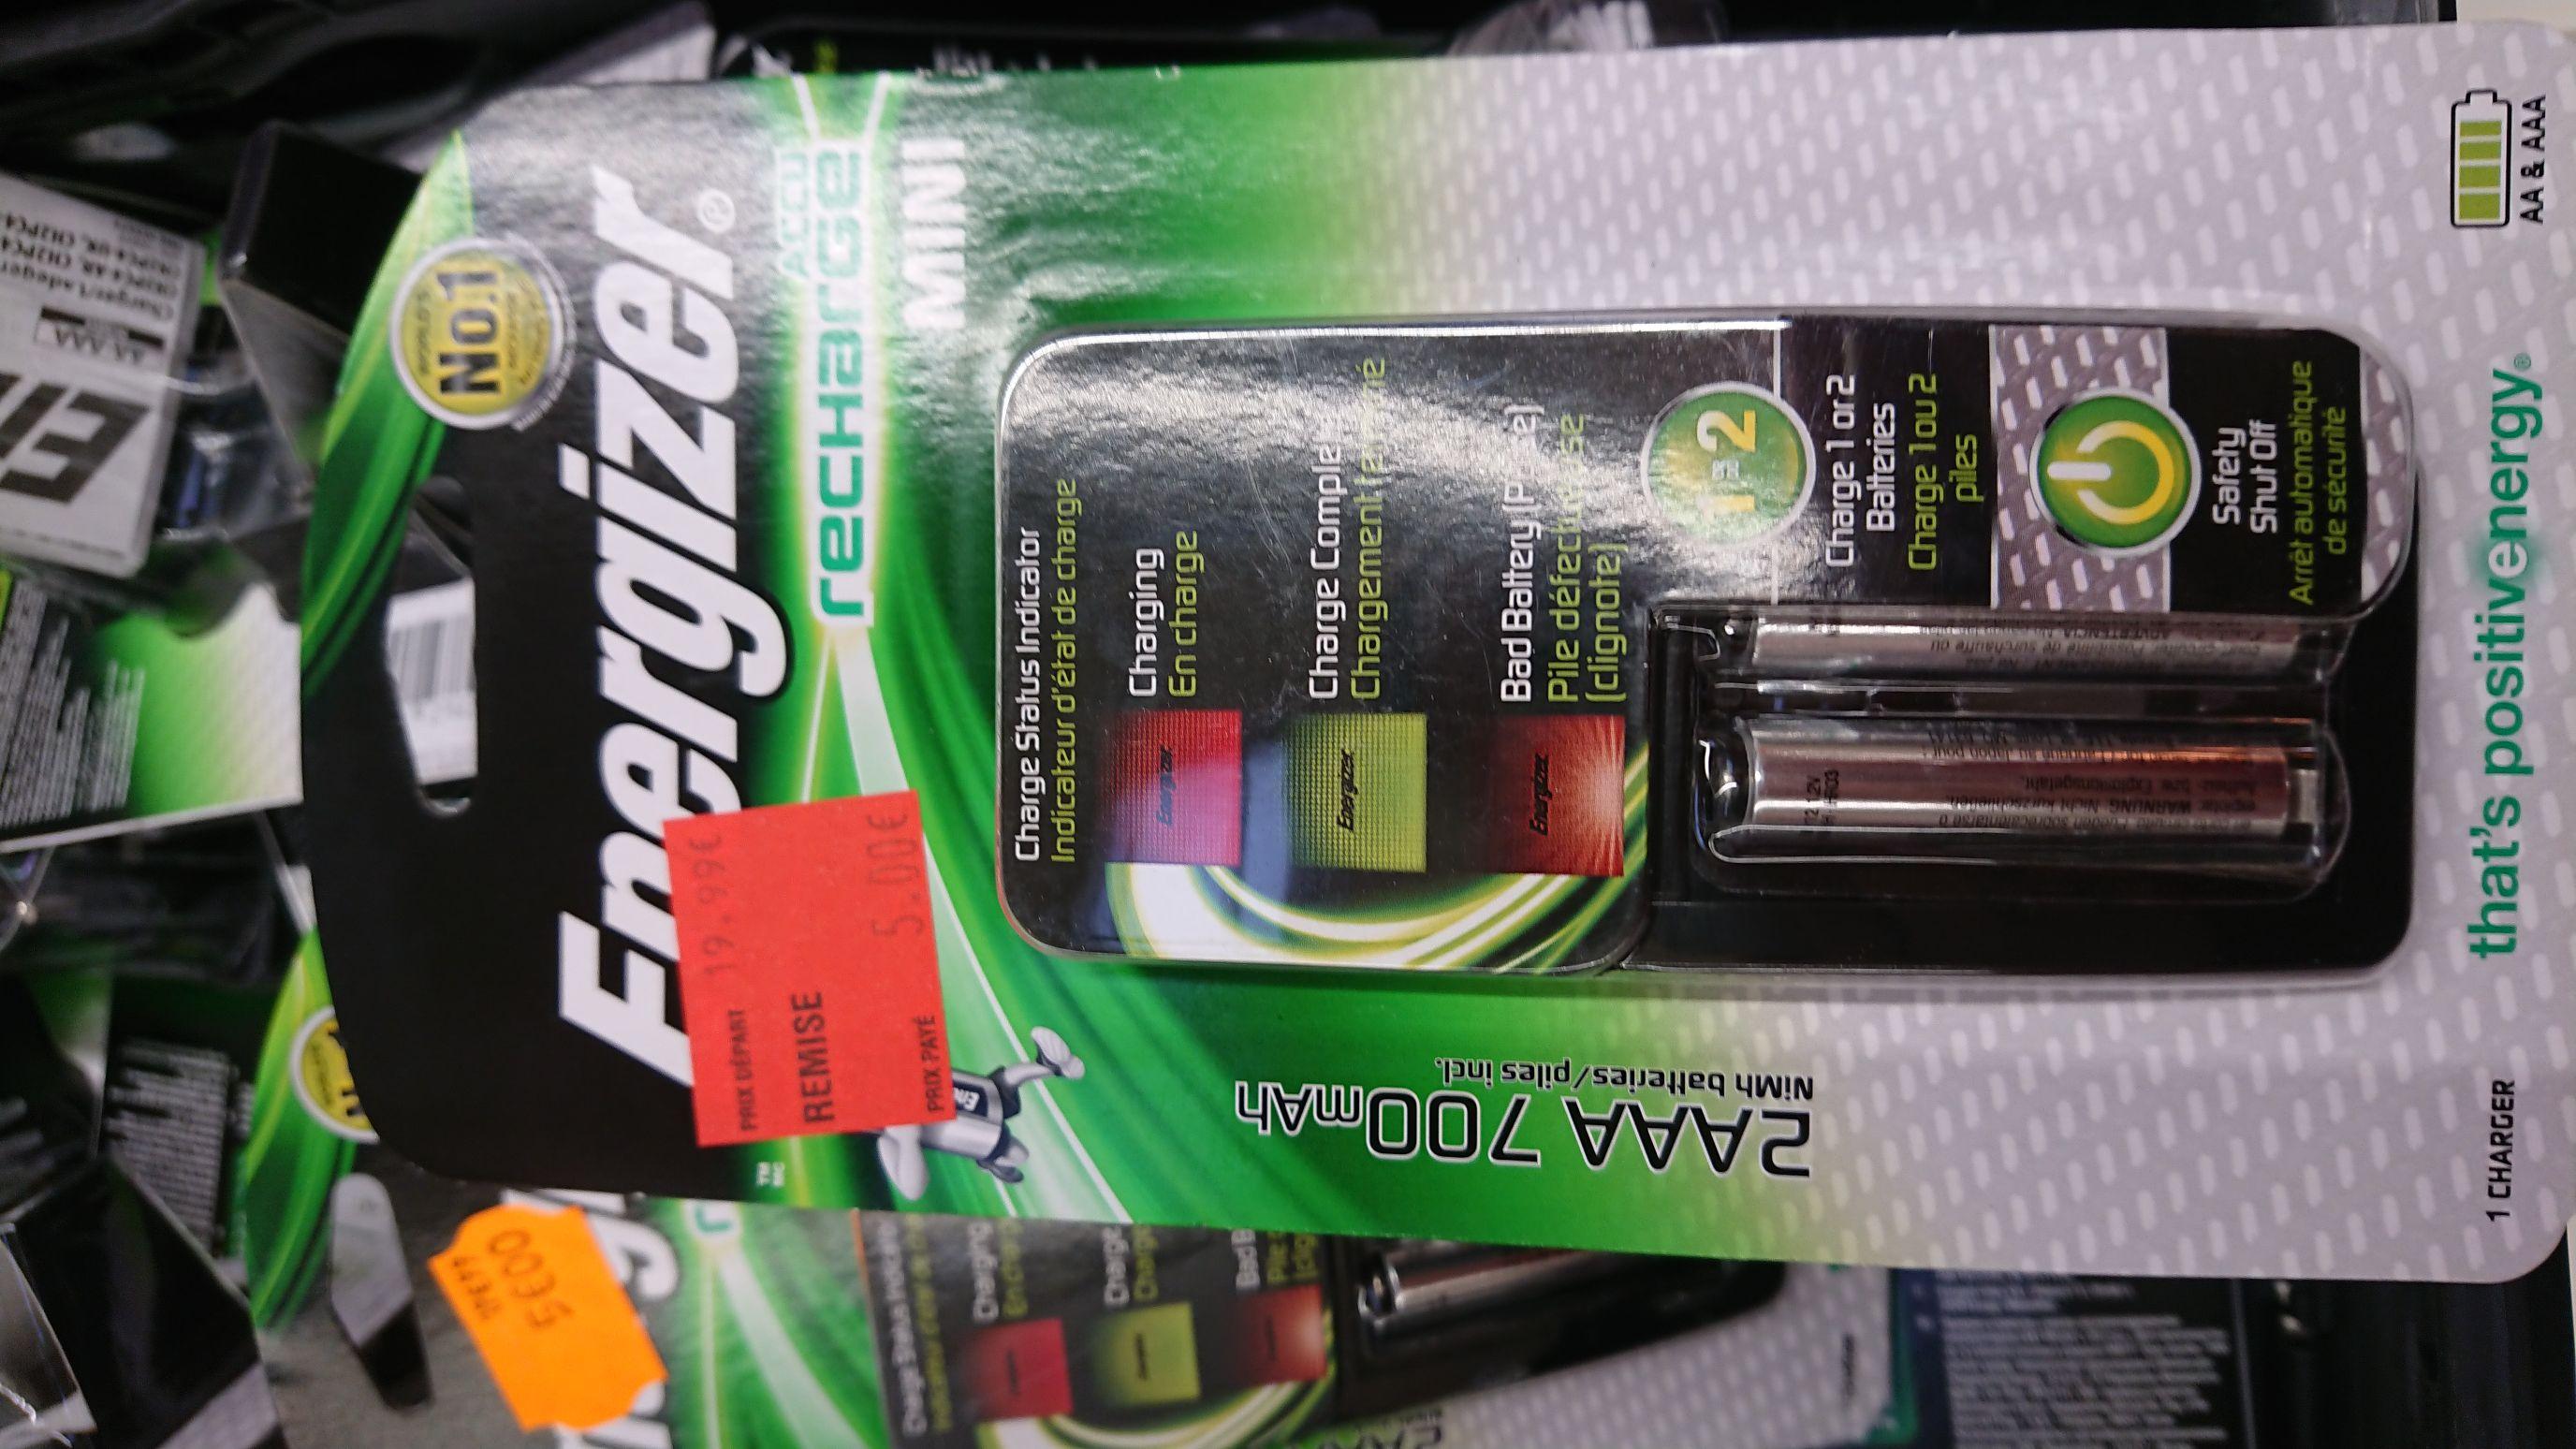 Chargeur de piles Energizer Accu Recharge Mini AA & AAA + 2 accus AAA inclus - Mérignac (33)